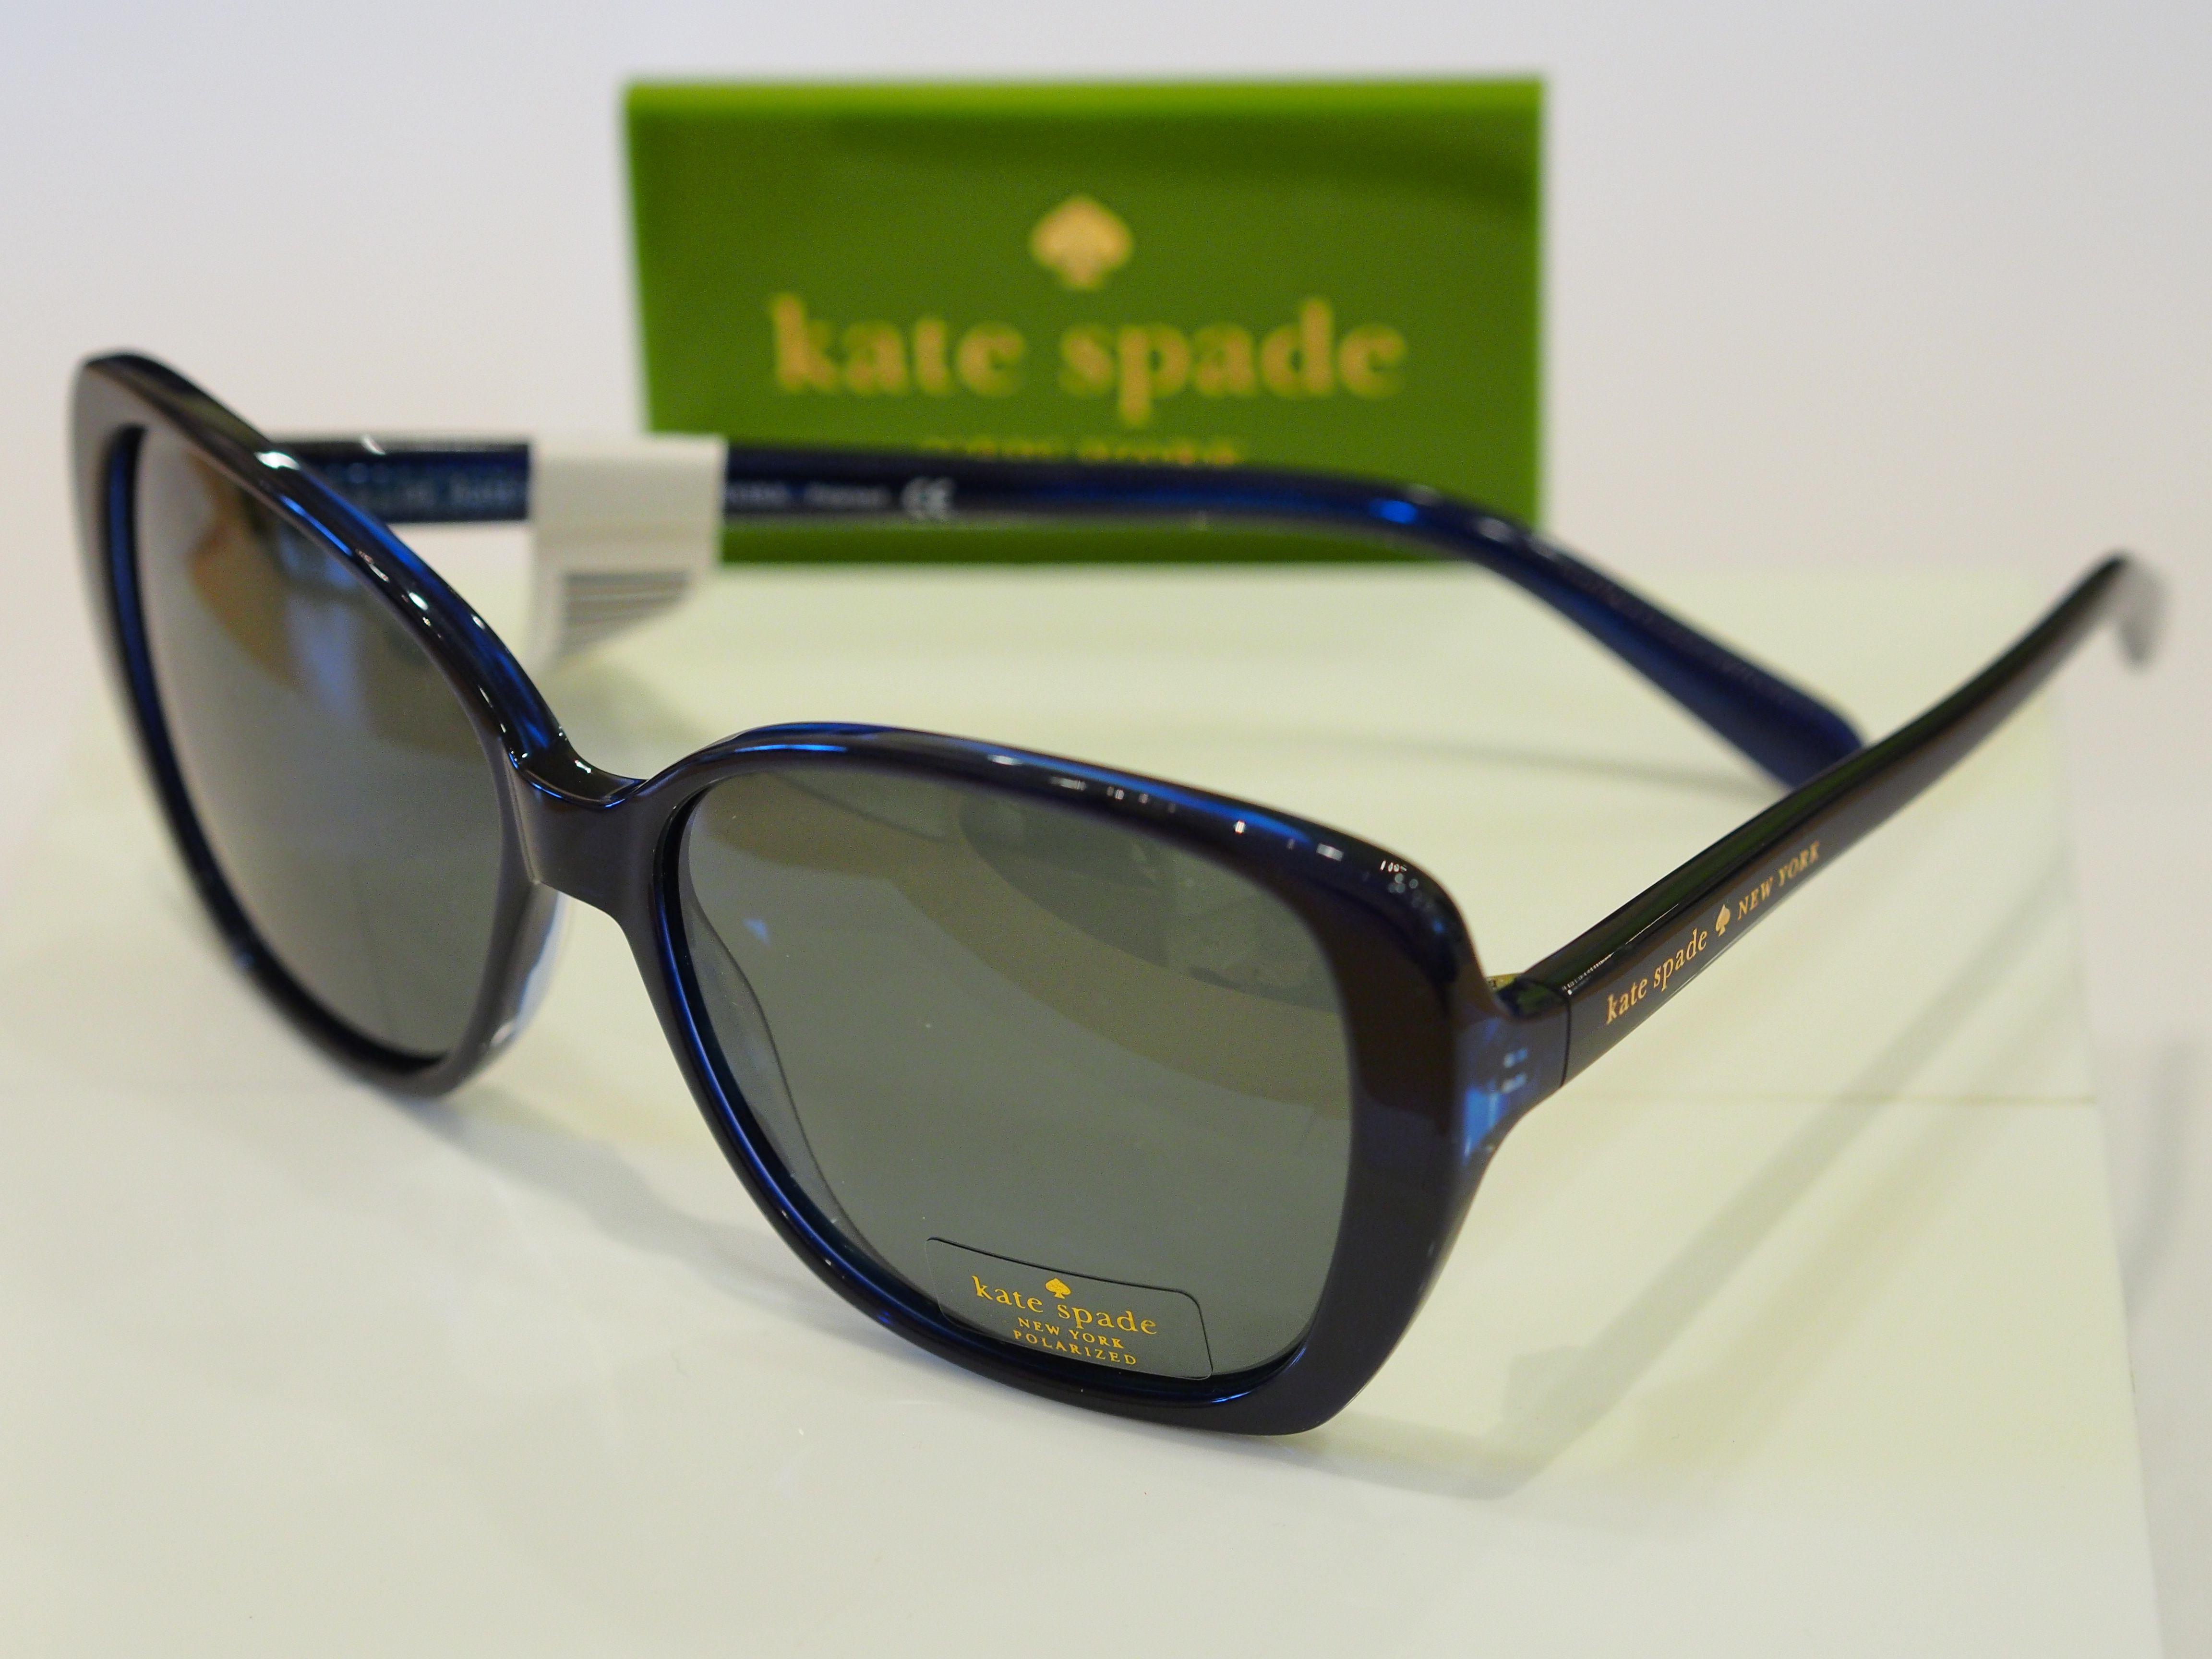 Kate Spade Eyeglass Frames 2014 : Kate Spade sunglasses 2014 Clothing Looks I Love Pinterest